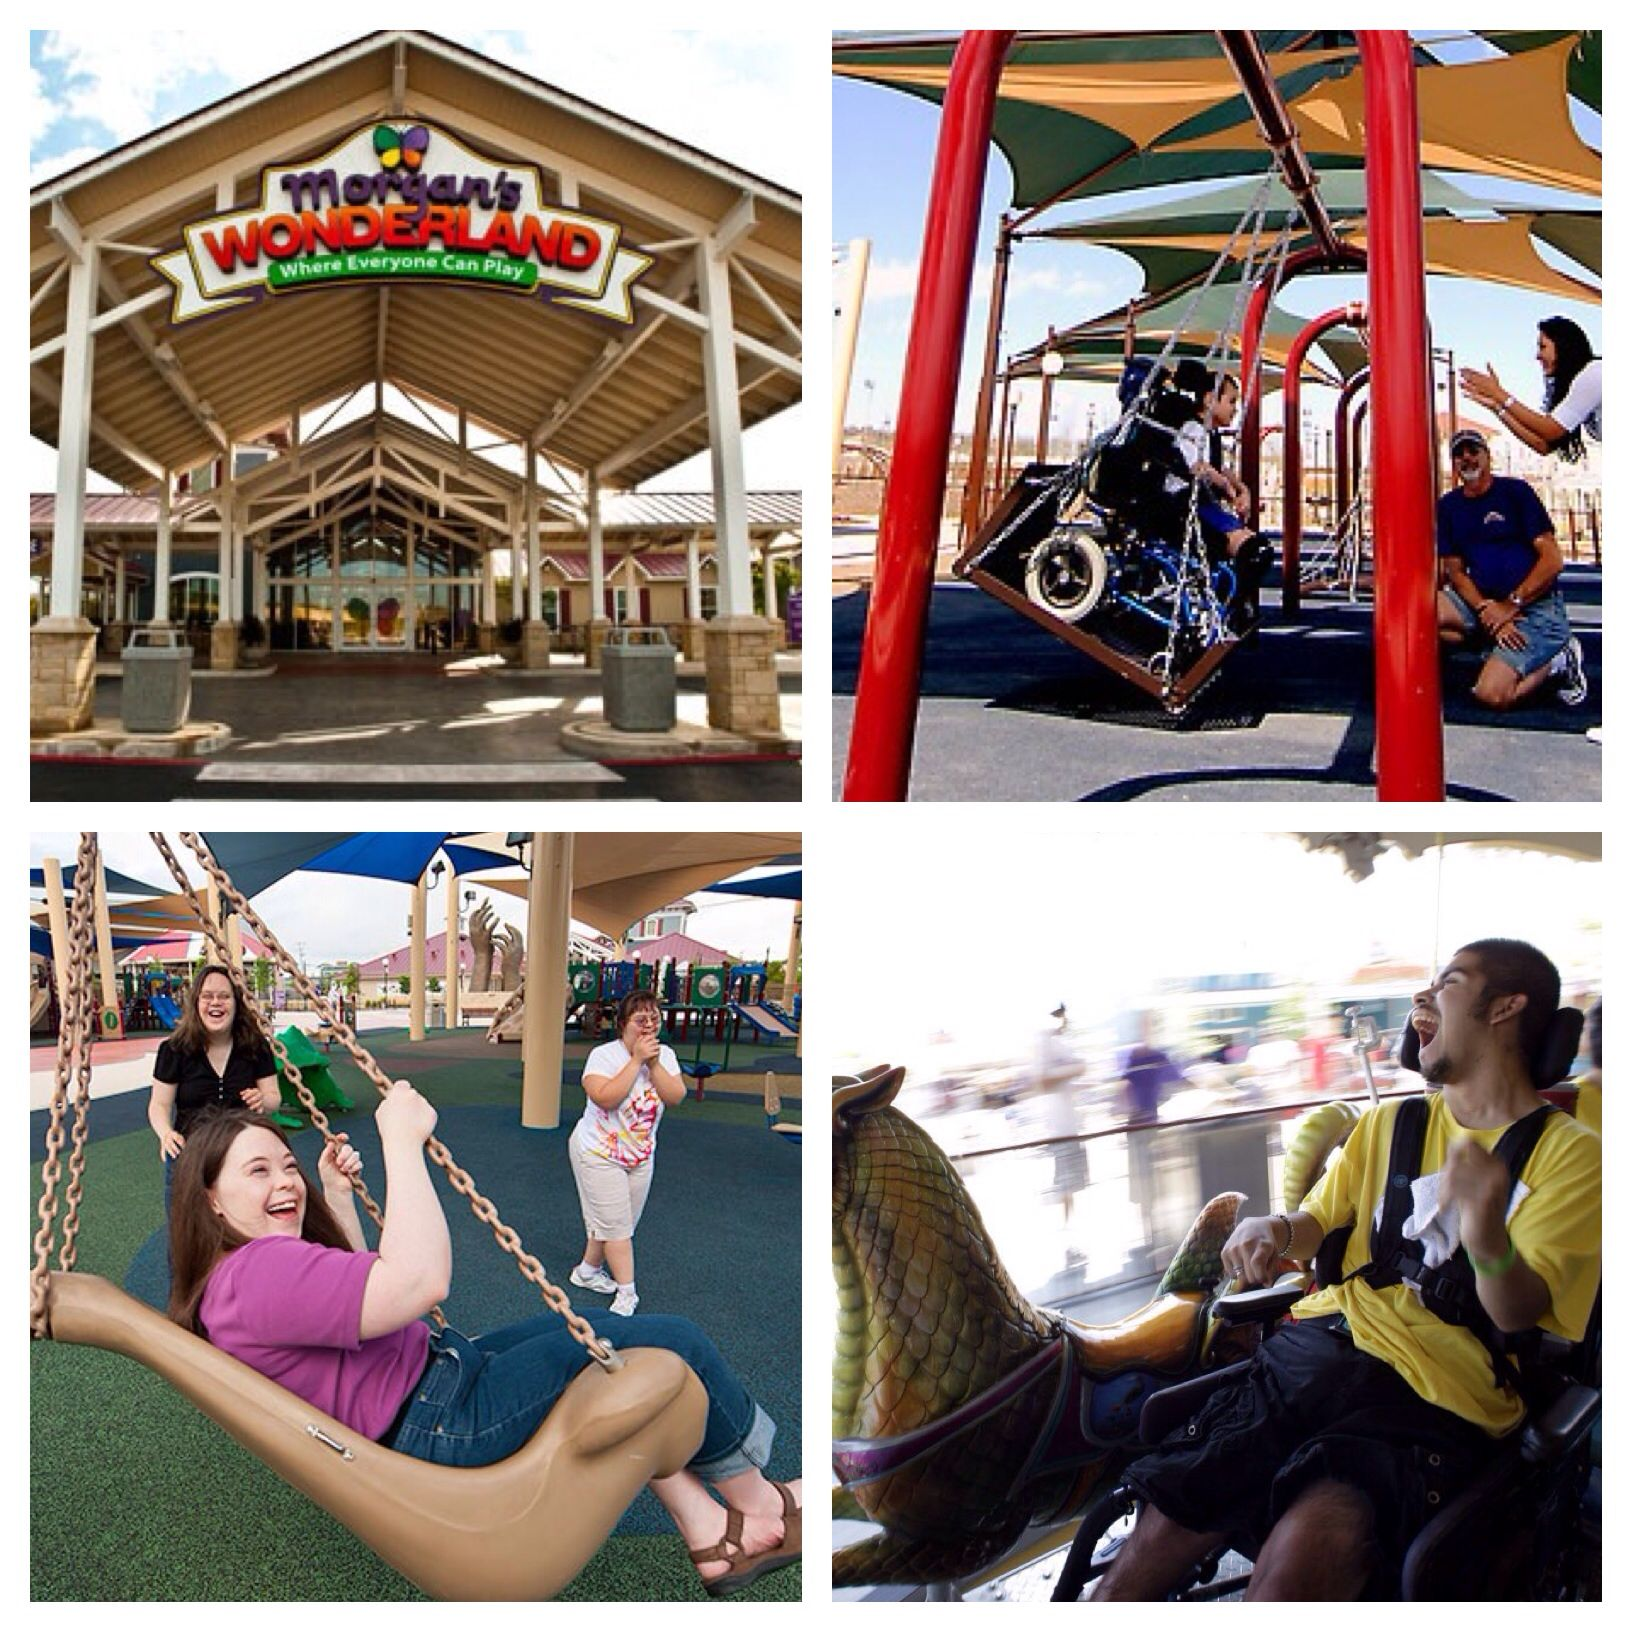 Morgan S Wonderland Is A 25 Acres Accessible Amusement